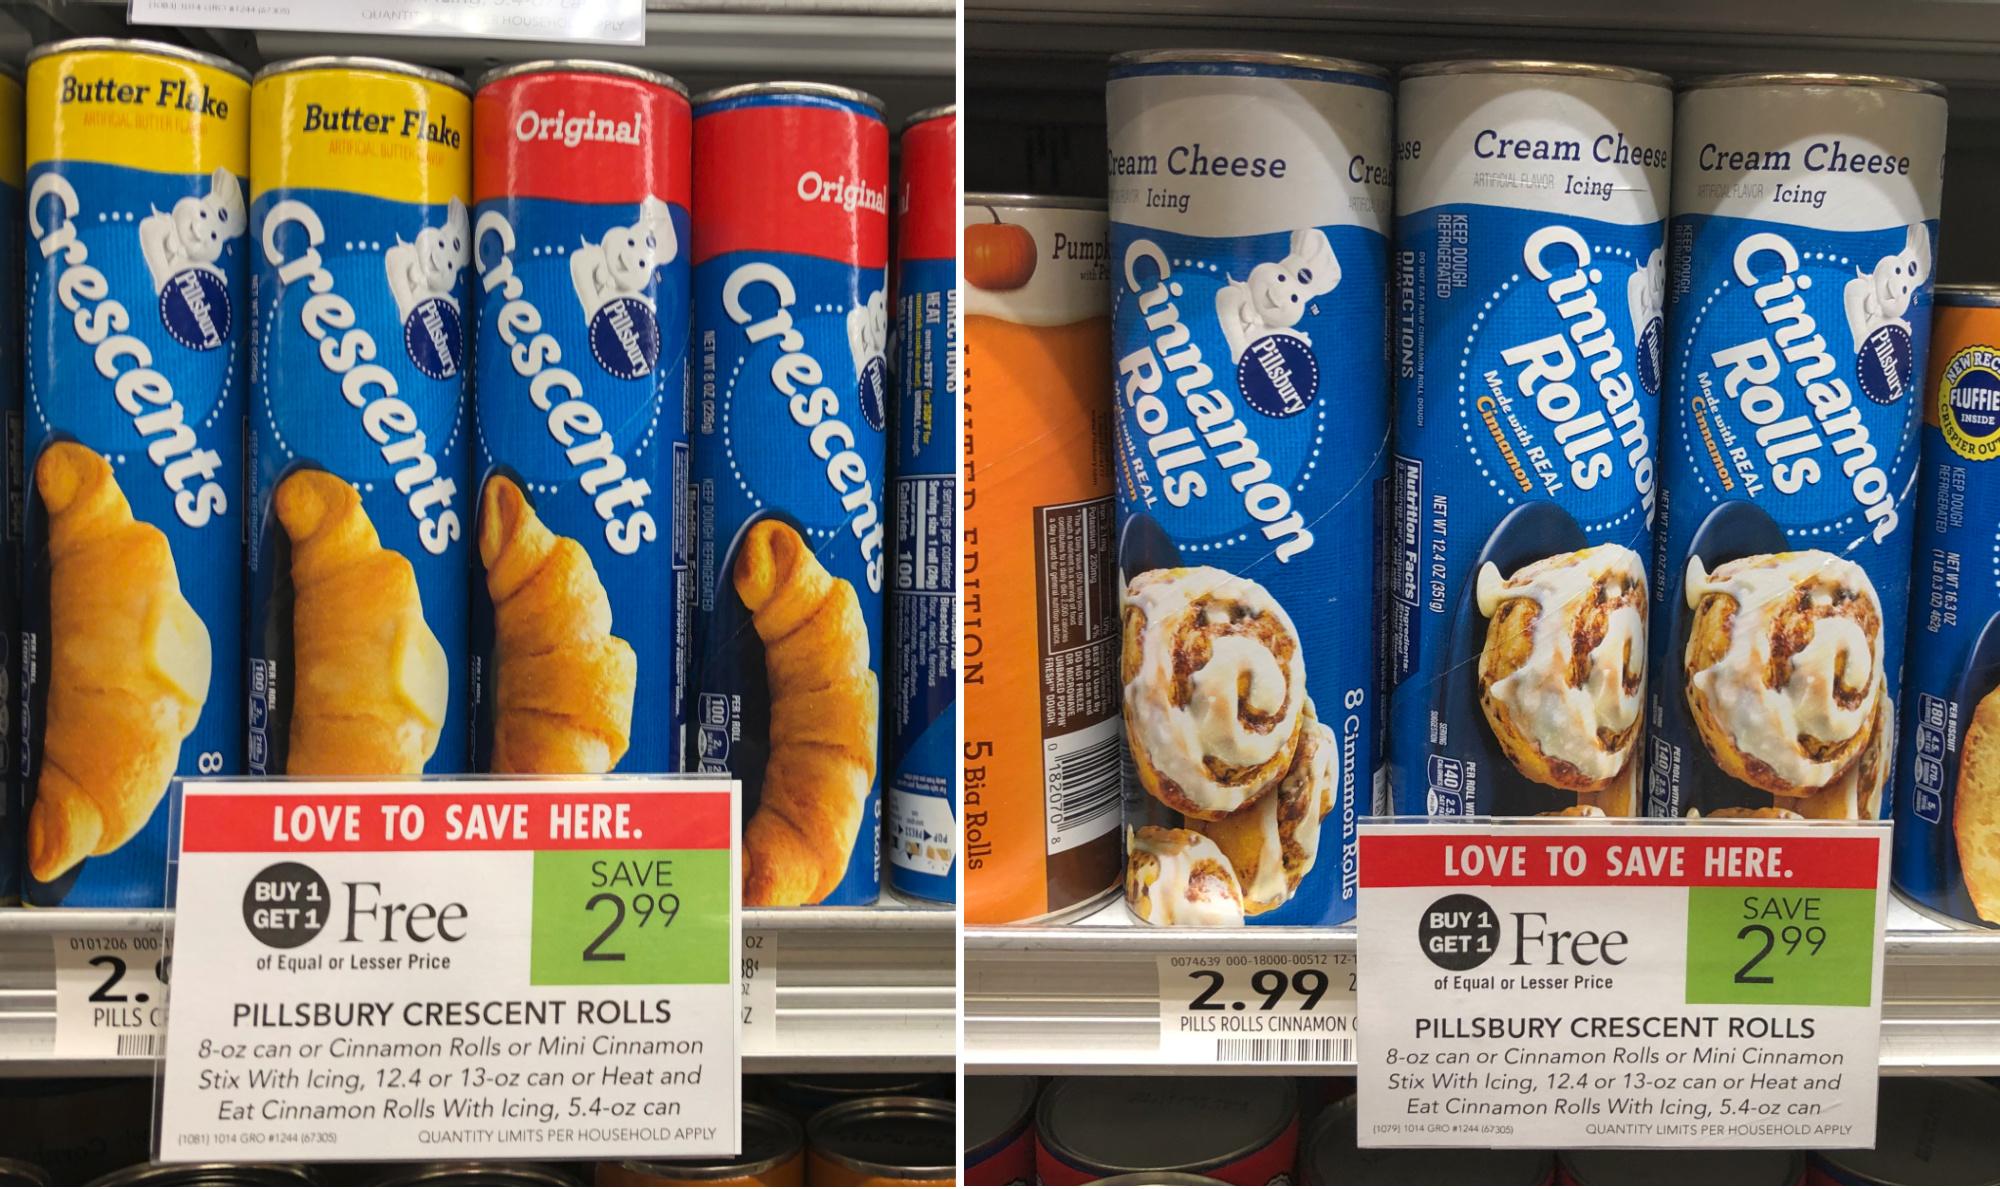 Pillsbury Crescents & Cinnamon Rolls As Low As $1.17 Per Can At Publix on I Heart Publix